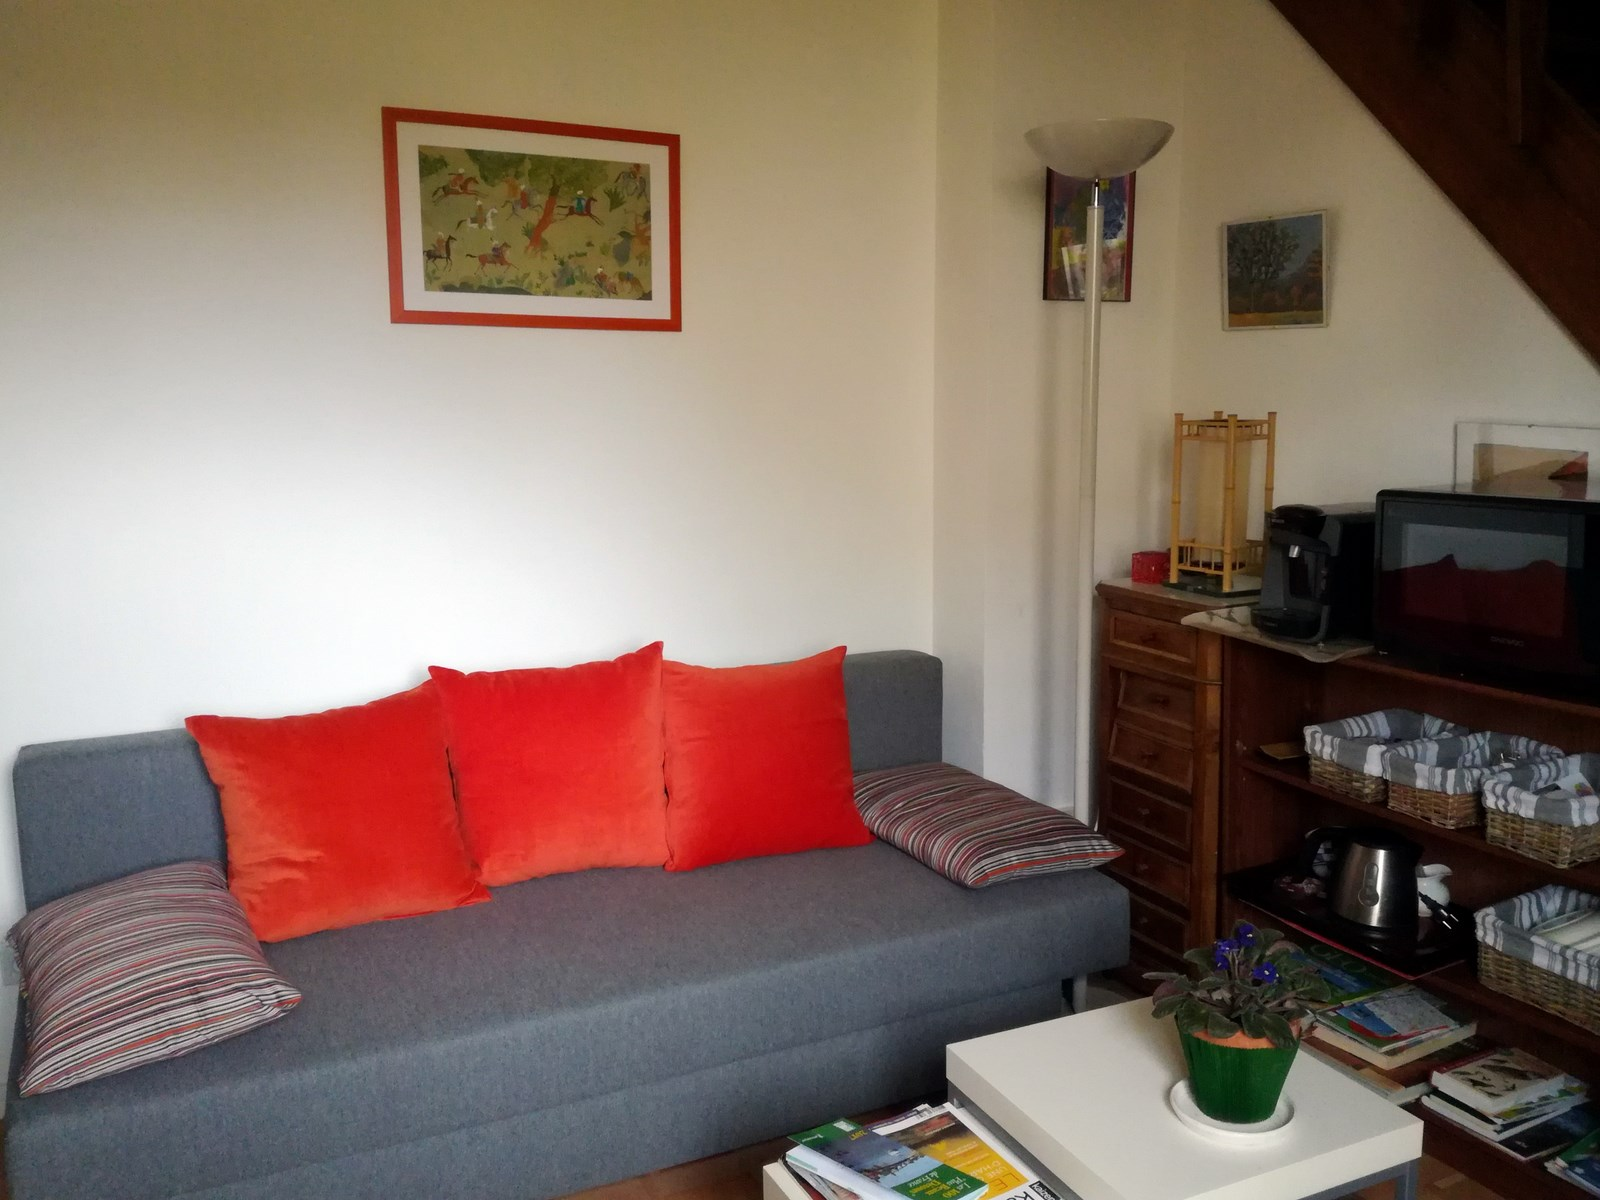 bed and breakfast au clos des varnelles near bar le duc meuse. Black Bedroom Furniture Sets. Home Design Ideas